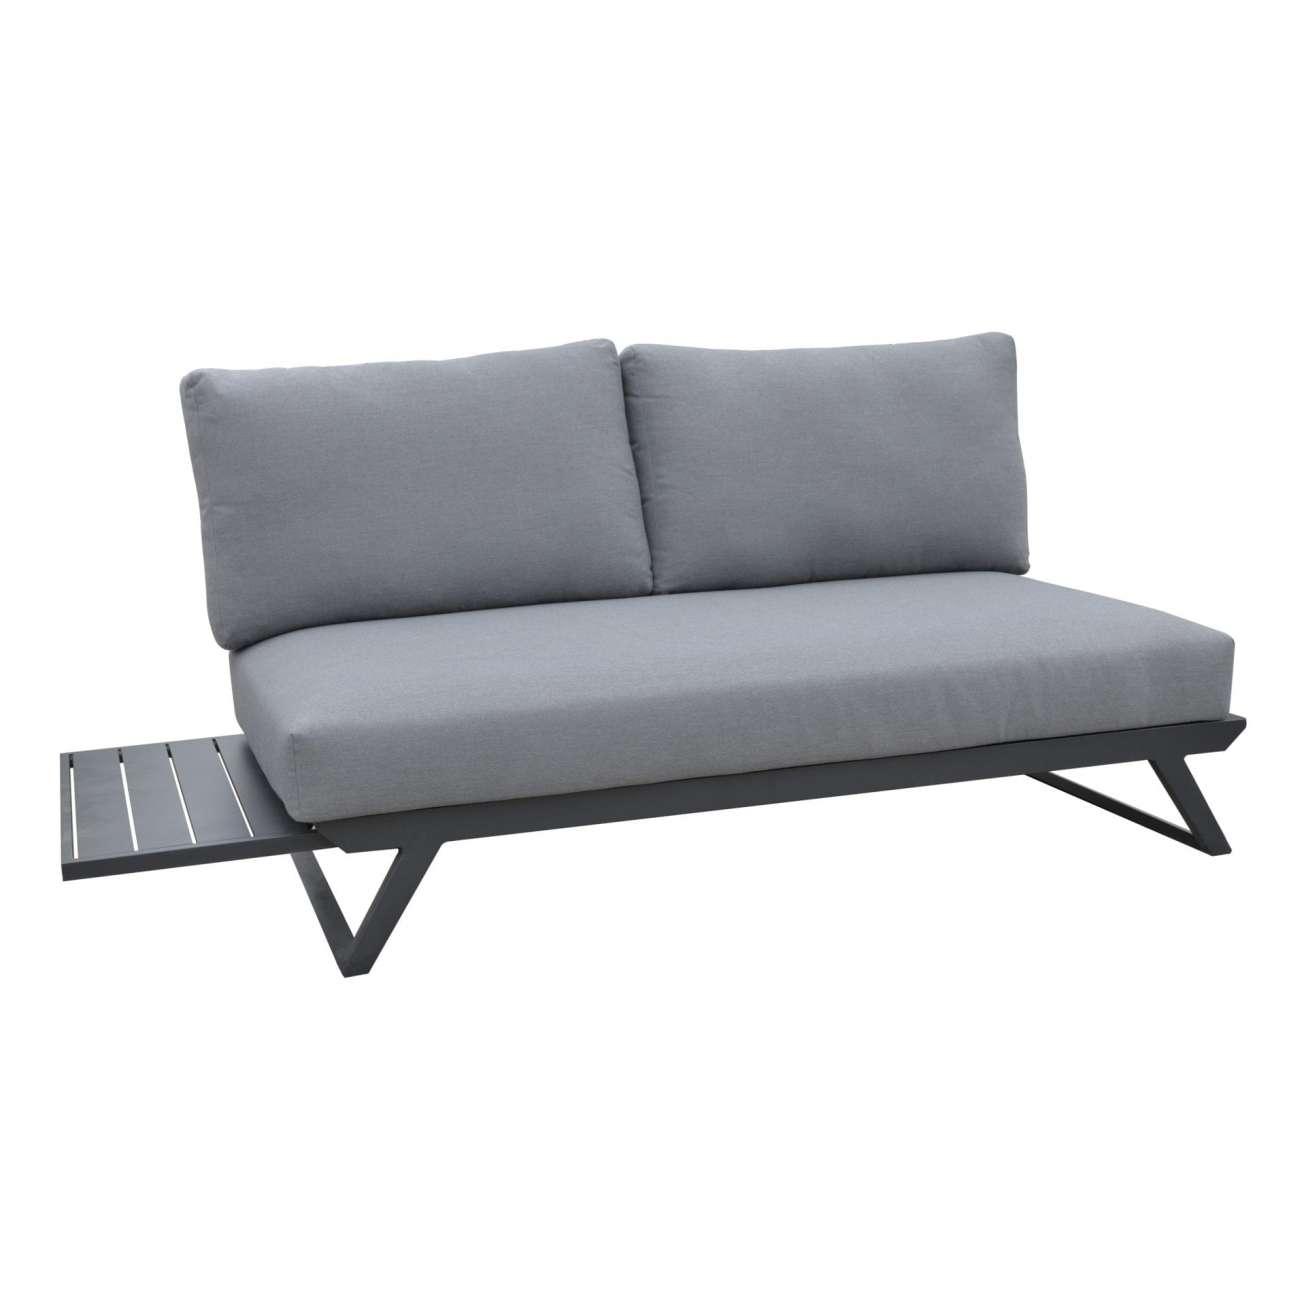 Gardenart fleksibel hjørnesofa - 2-seter i sort aluminium med sidebord og grå puter